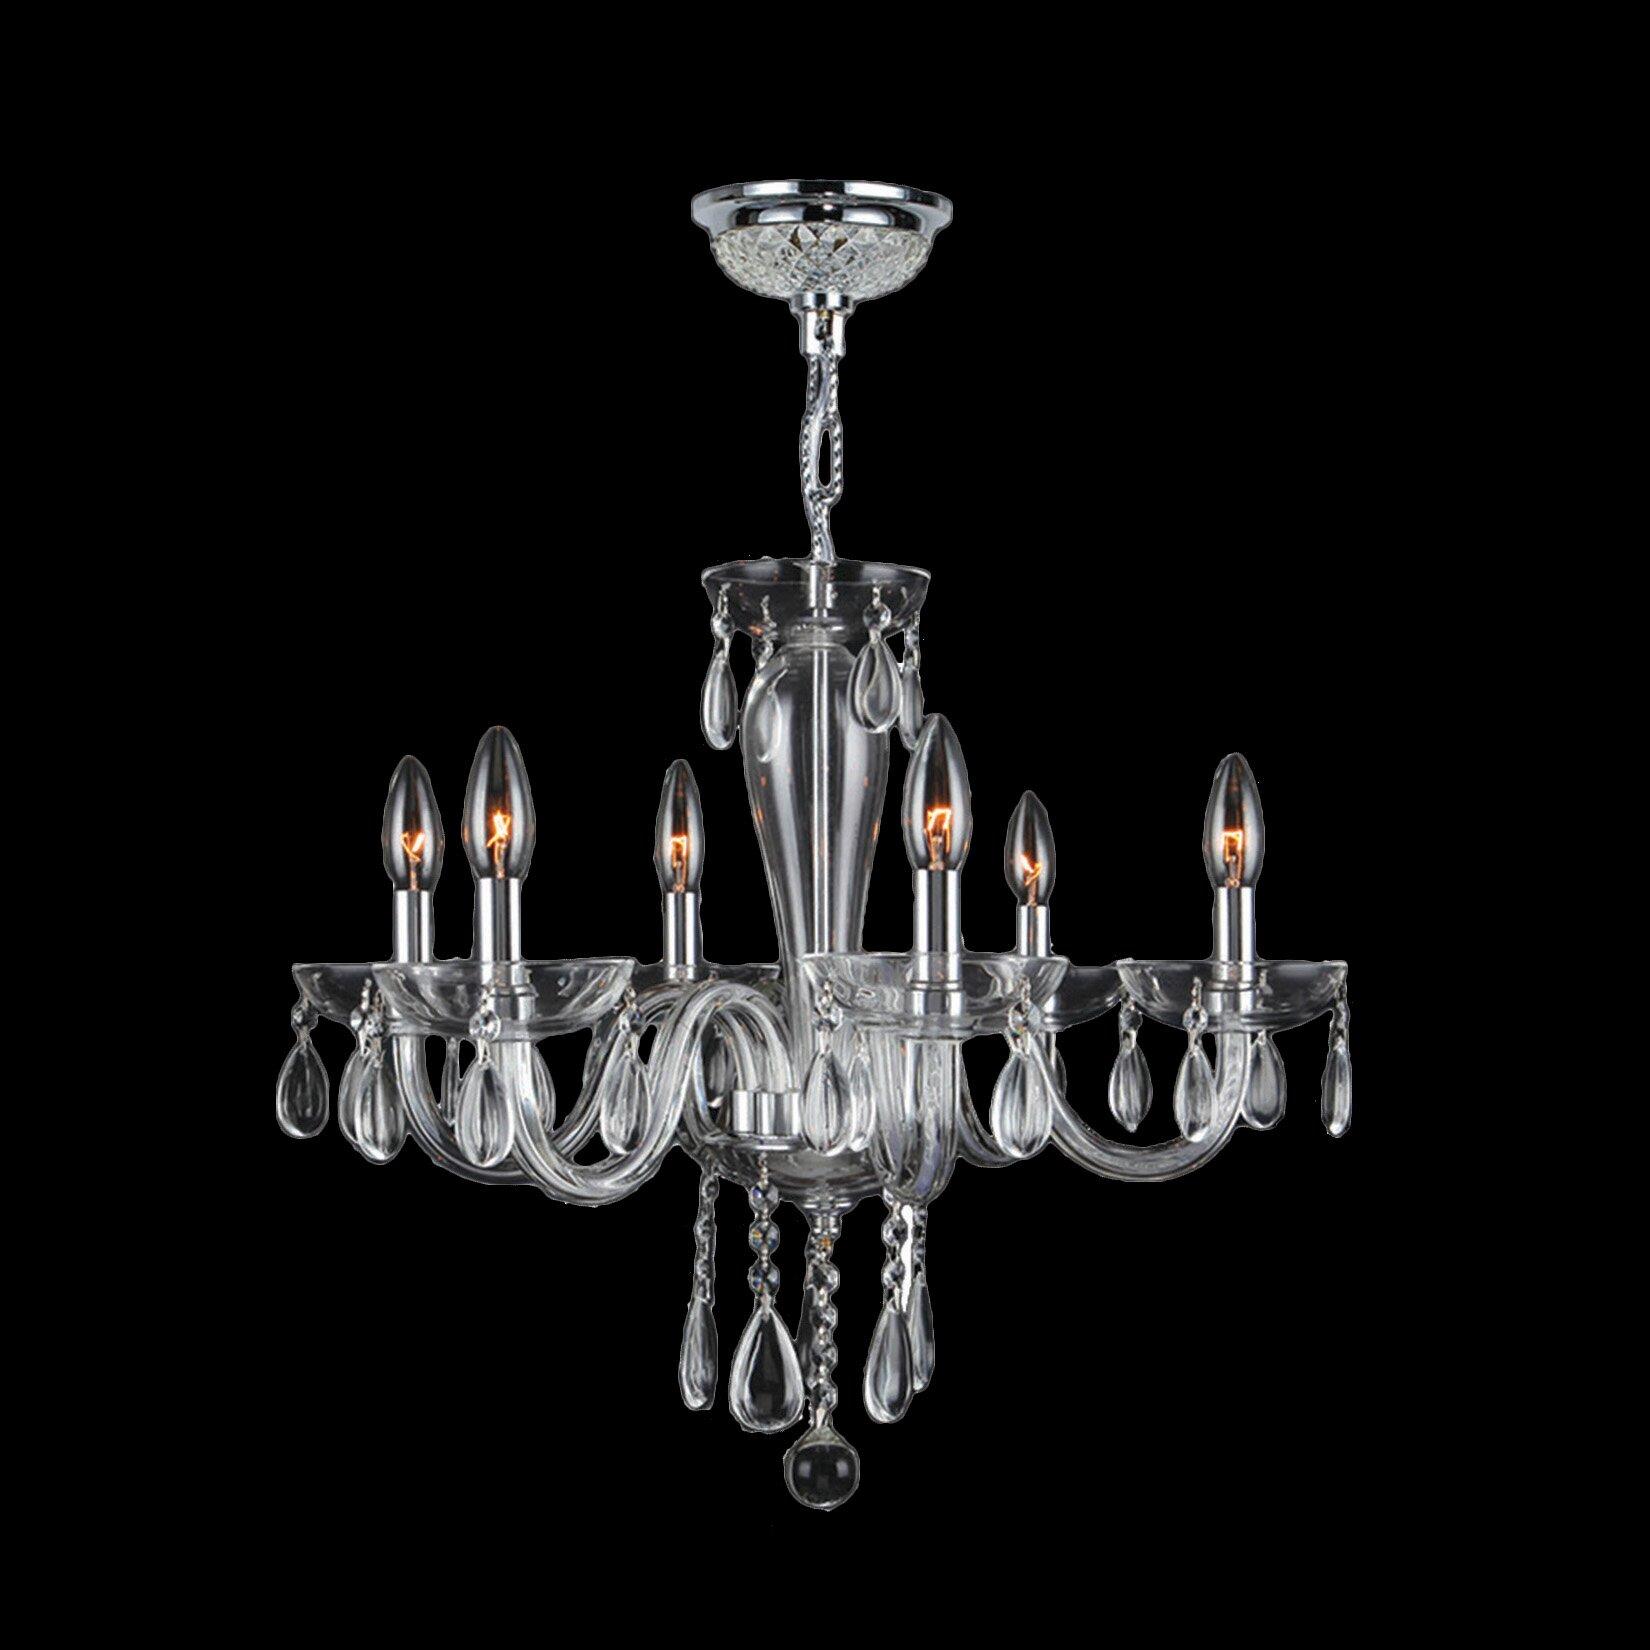 Worldwide Lighting Gastby 6 Light Chandelier & Reviews